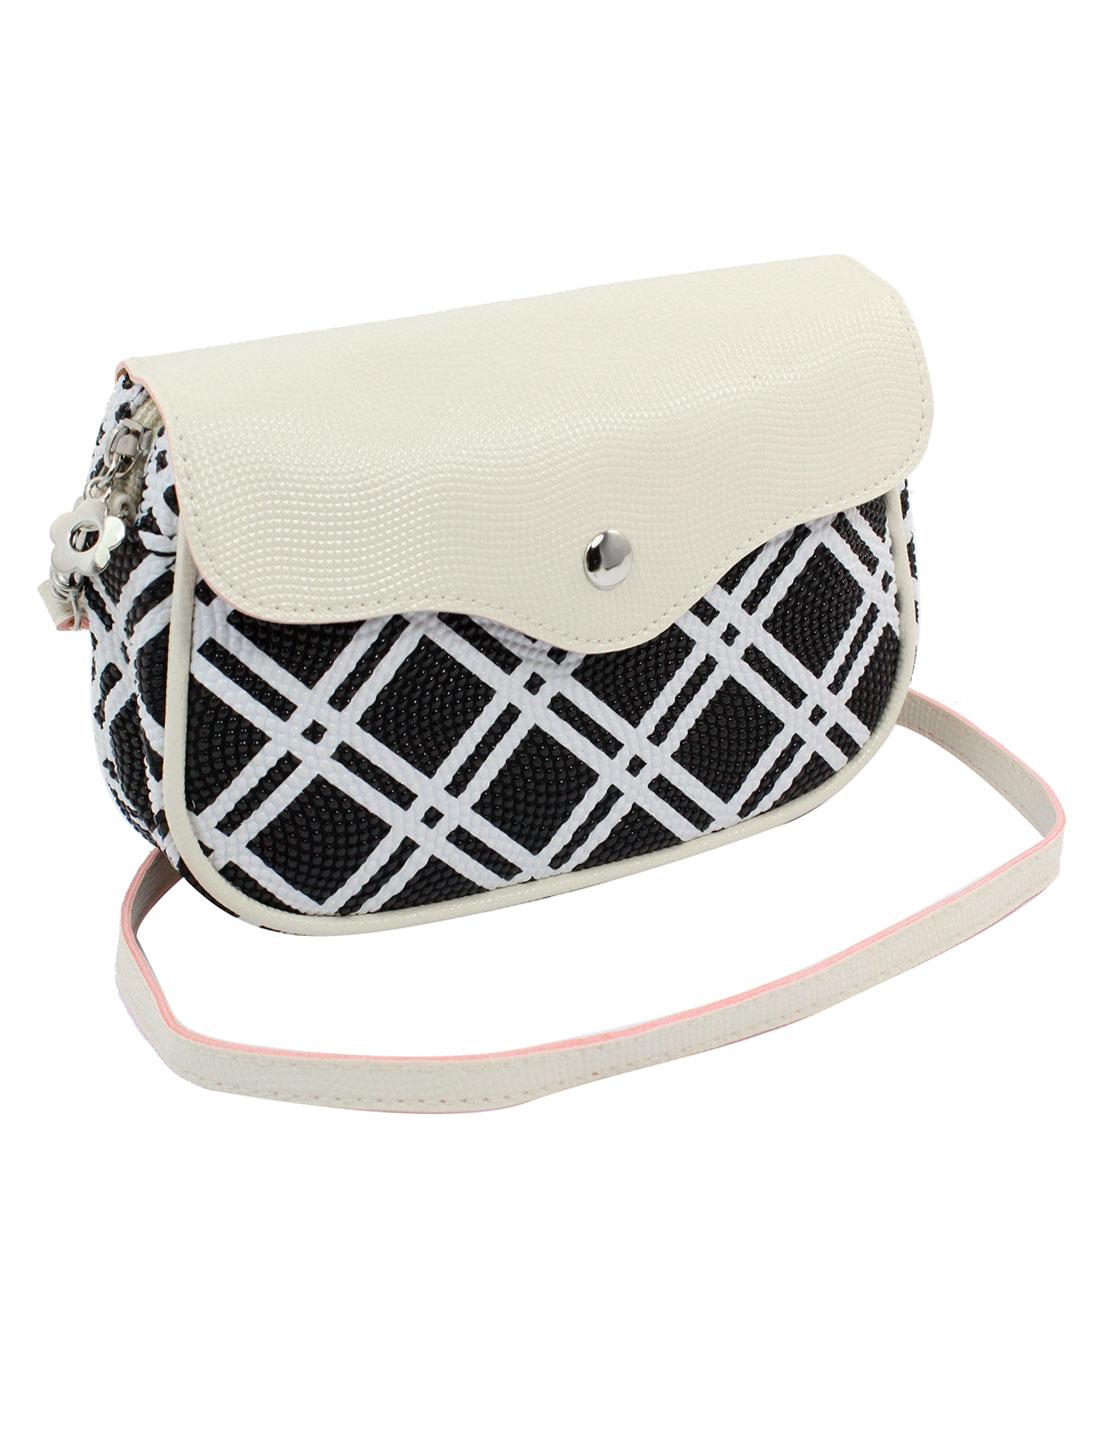 Women 2 Pockets Magnet Button Zipper Closure Check Pattern Faux Leather Wallet Purse Bag Black White w Strap